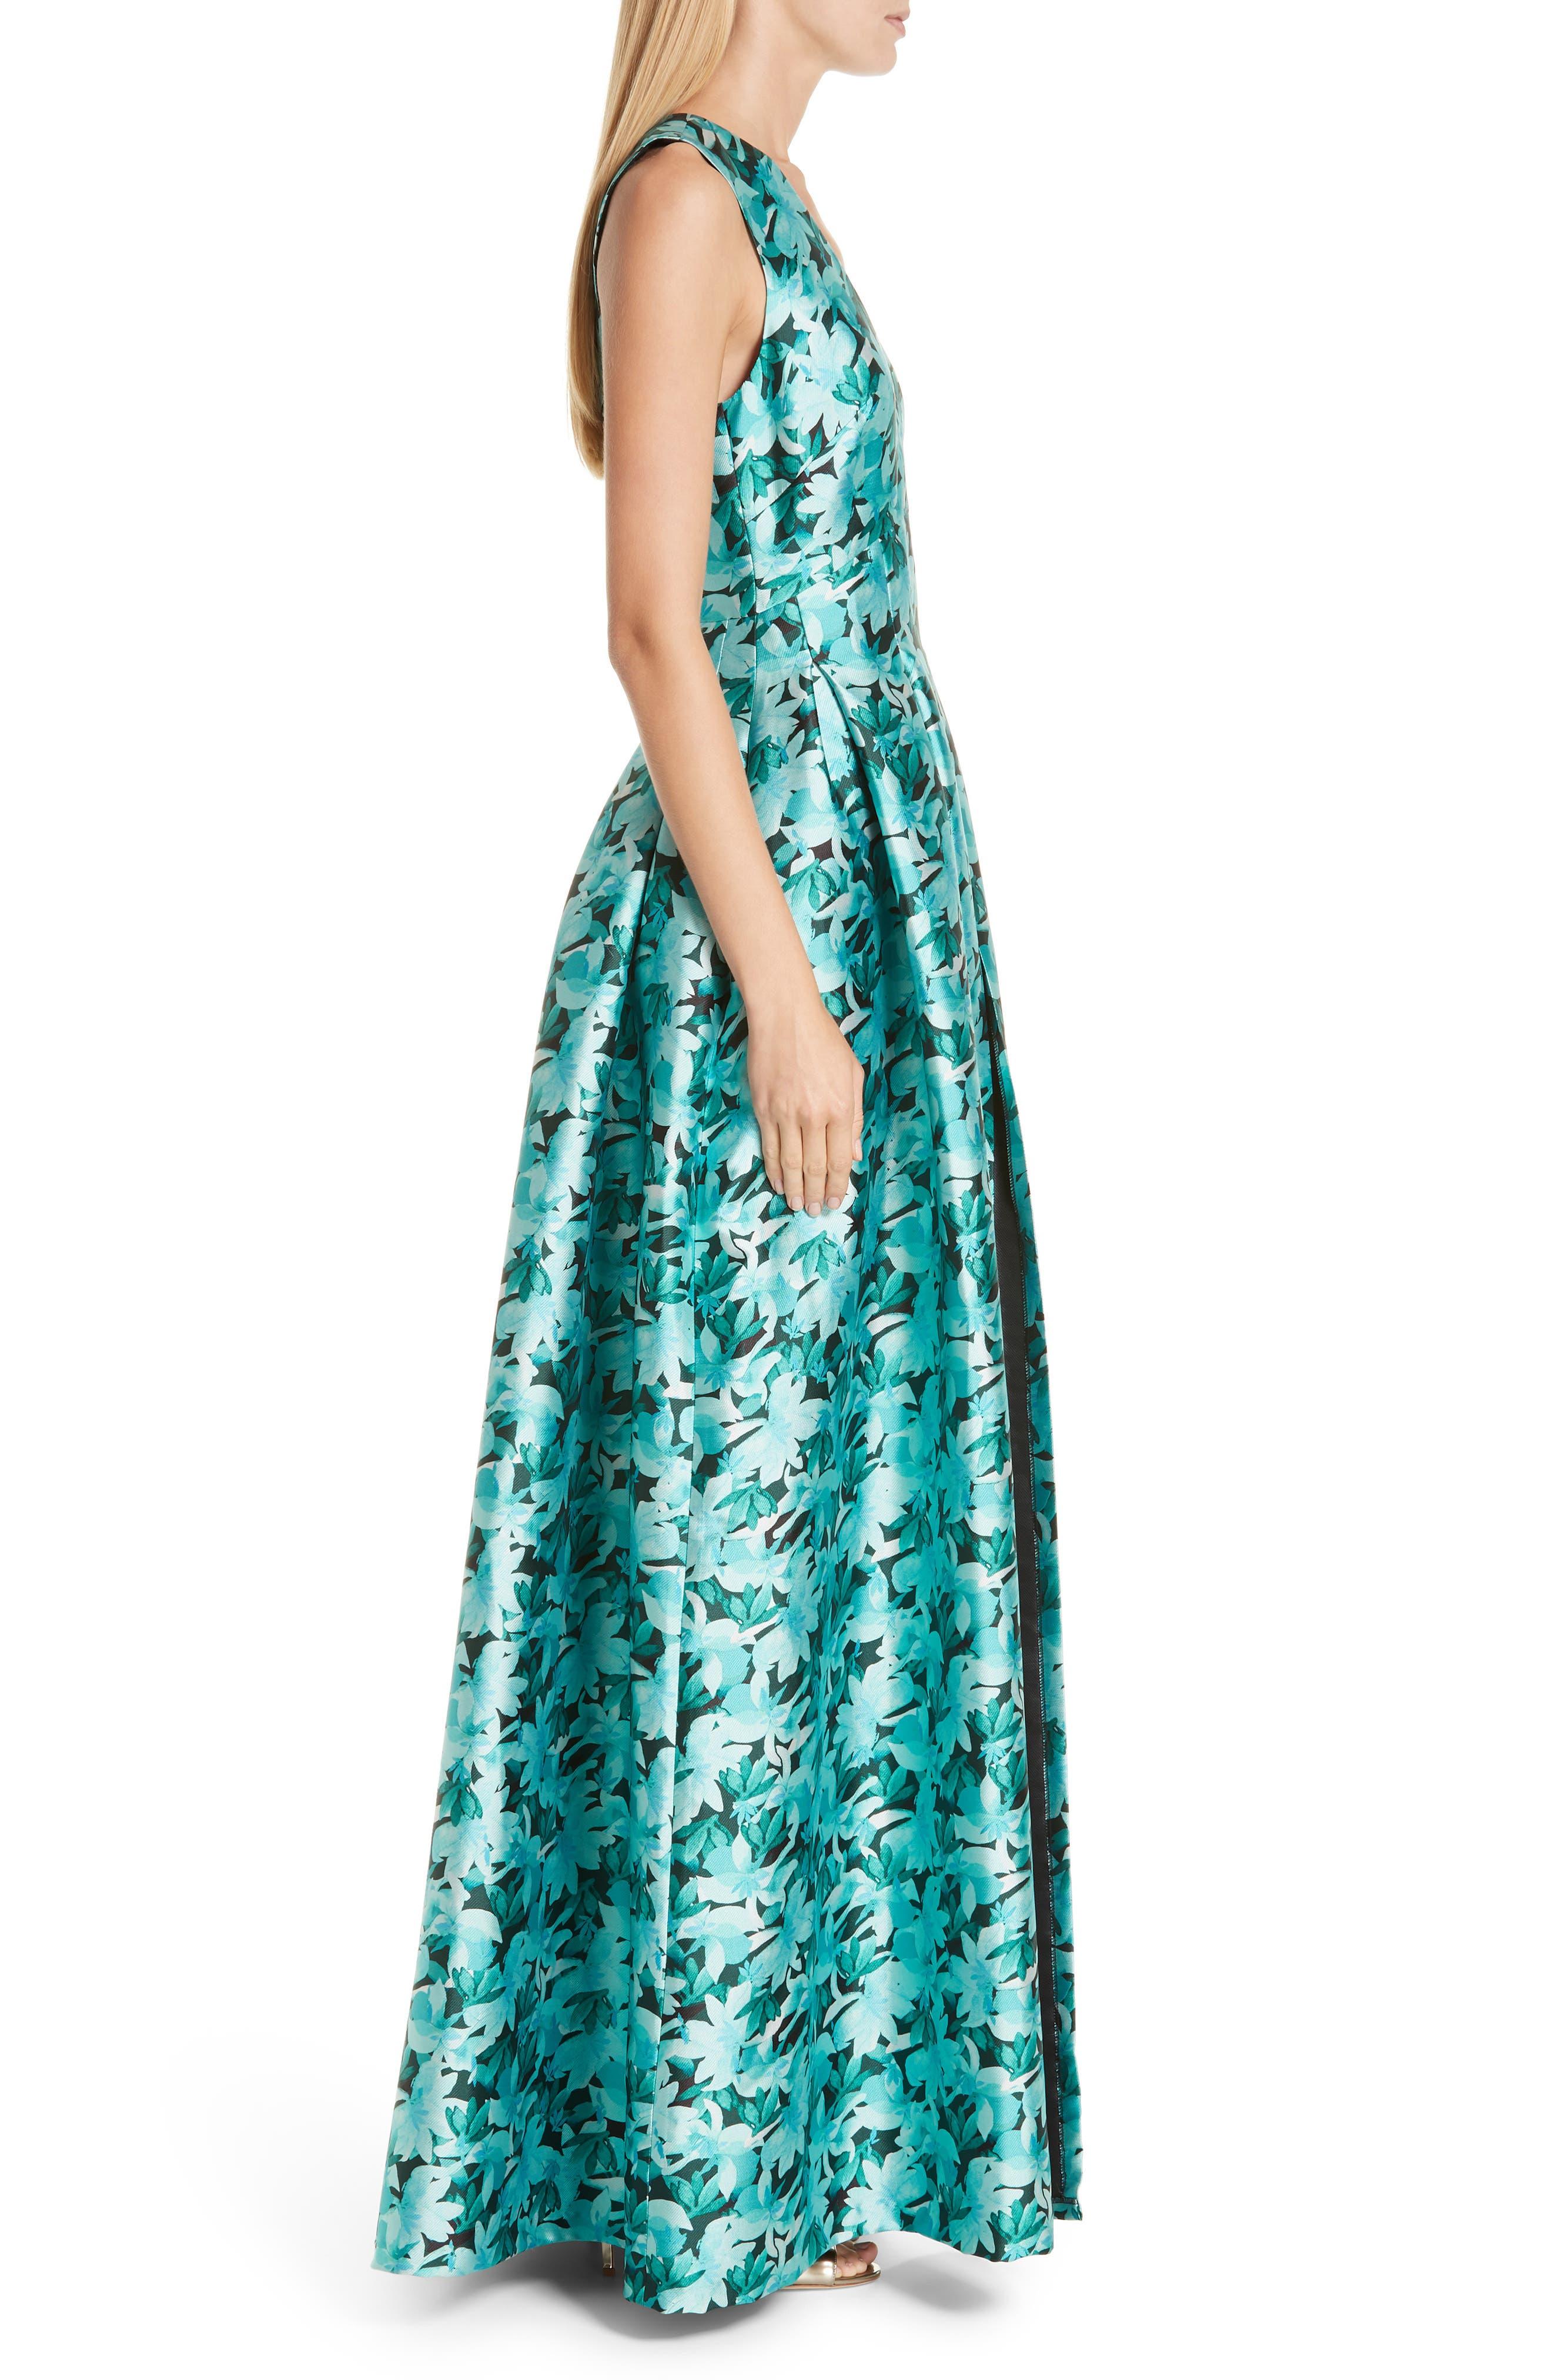 SACHIN & BABI, Brooke Floral Print Gown, Alternate thumbnail 4, color, TEAL